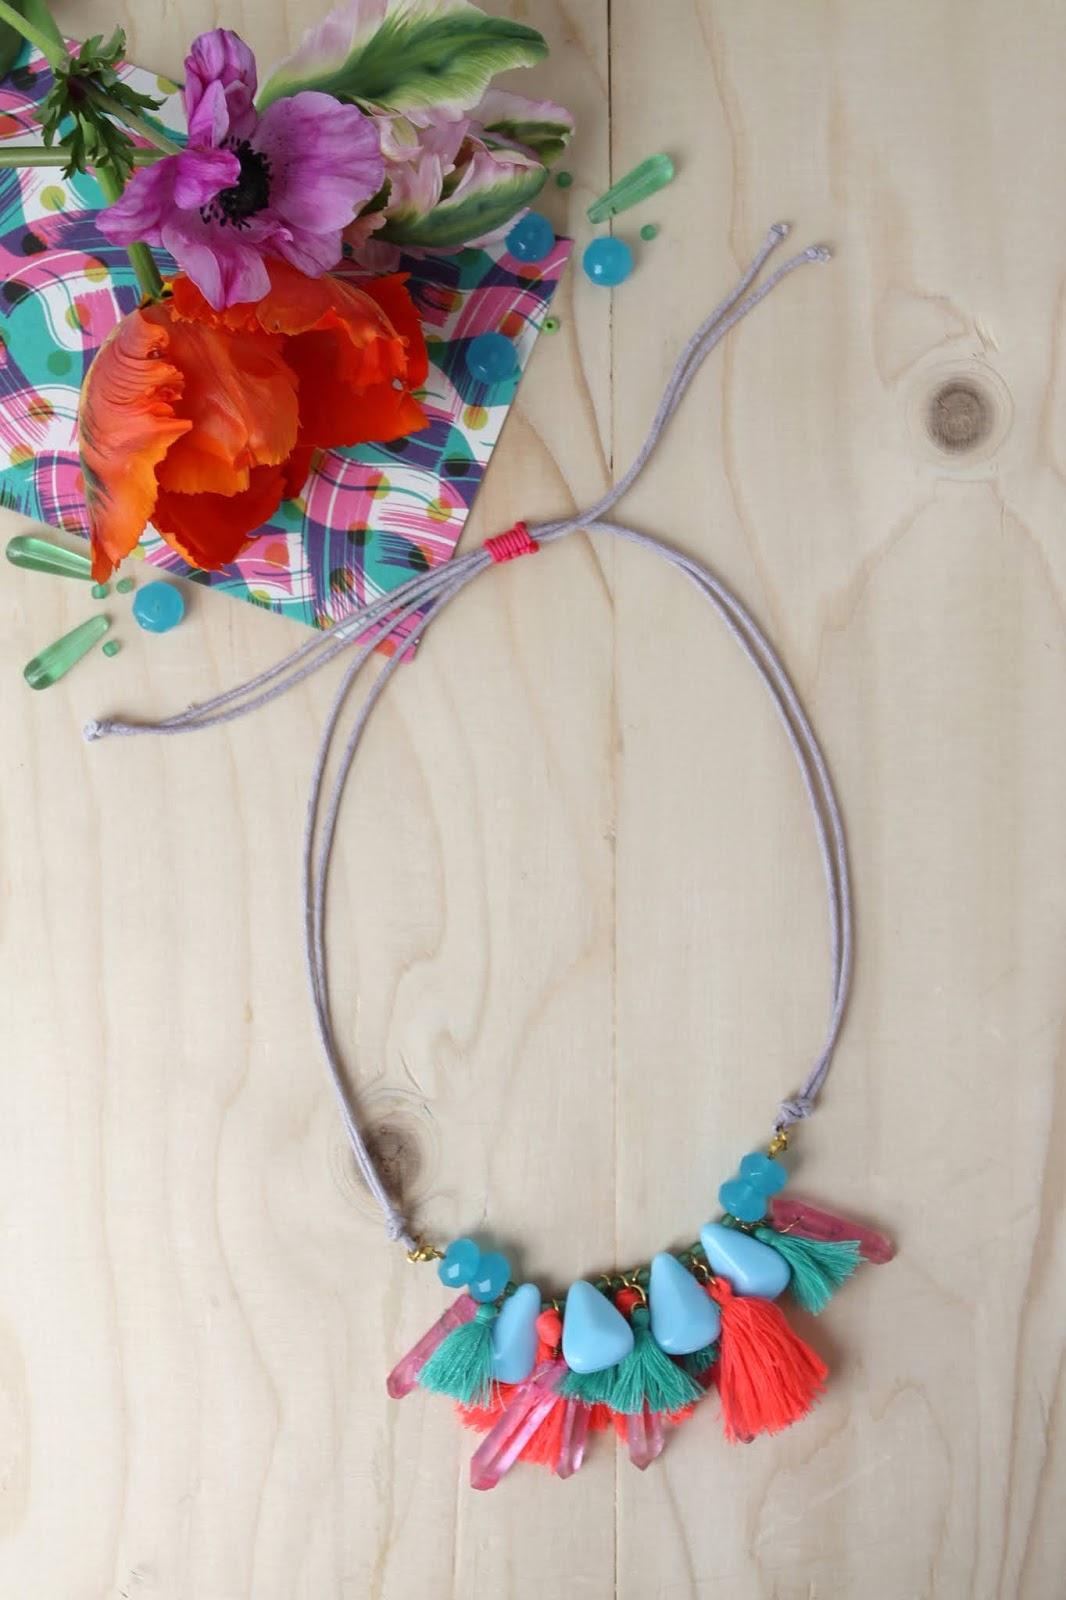 DIY – Colourful tassel necklace